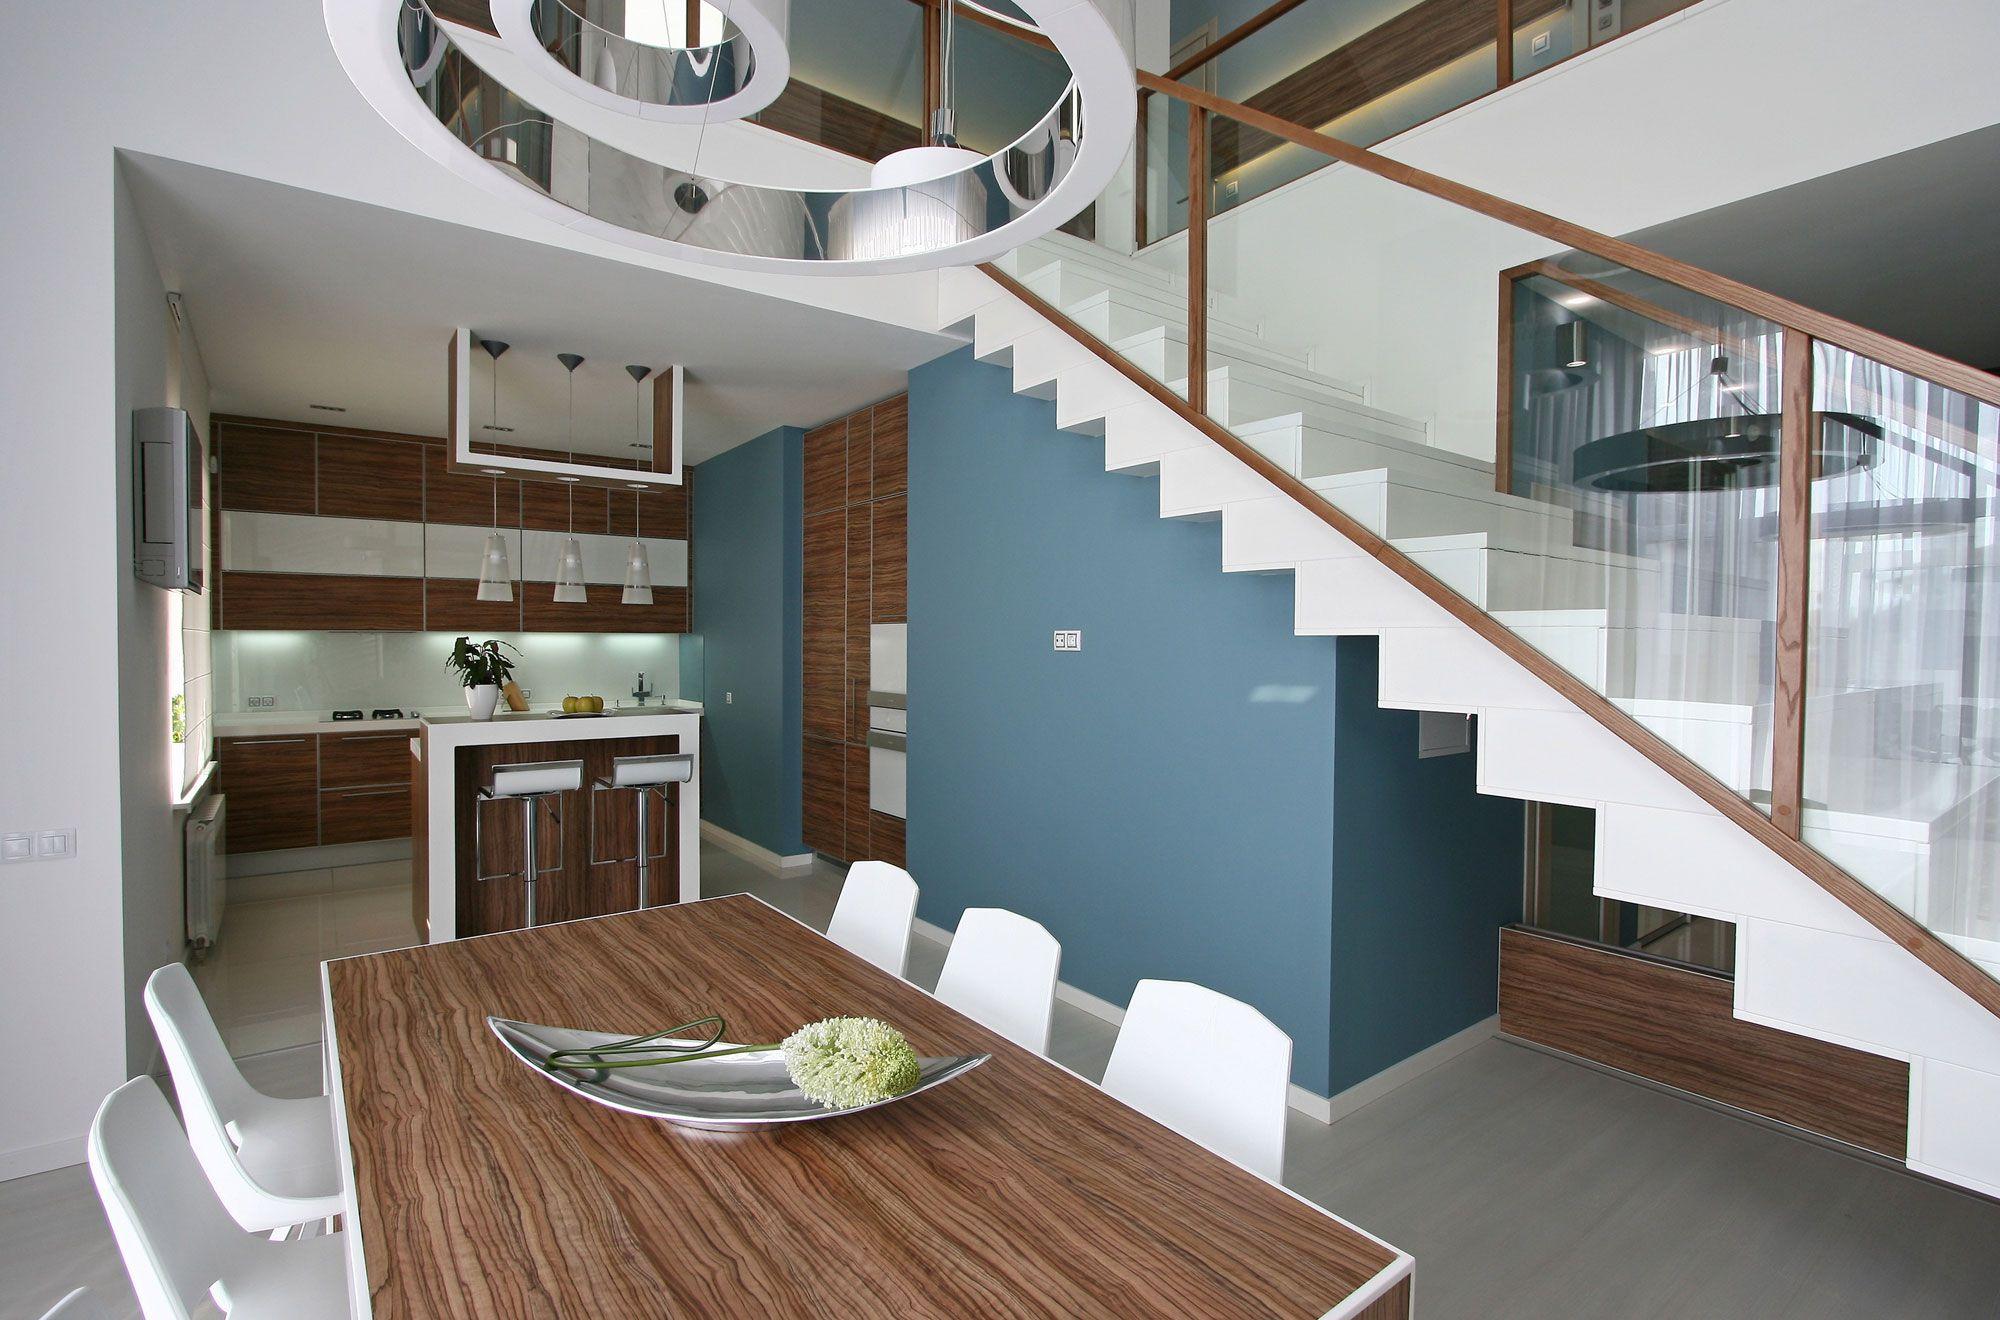 White sands by svoya studio caandesign architecture - Peindre un plafond en blanc mat ...